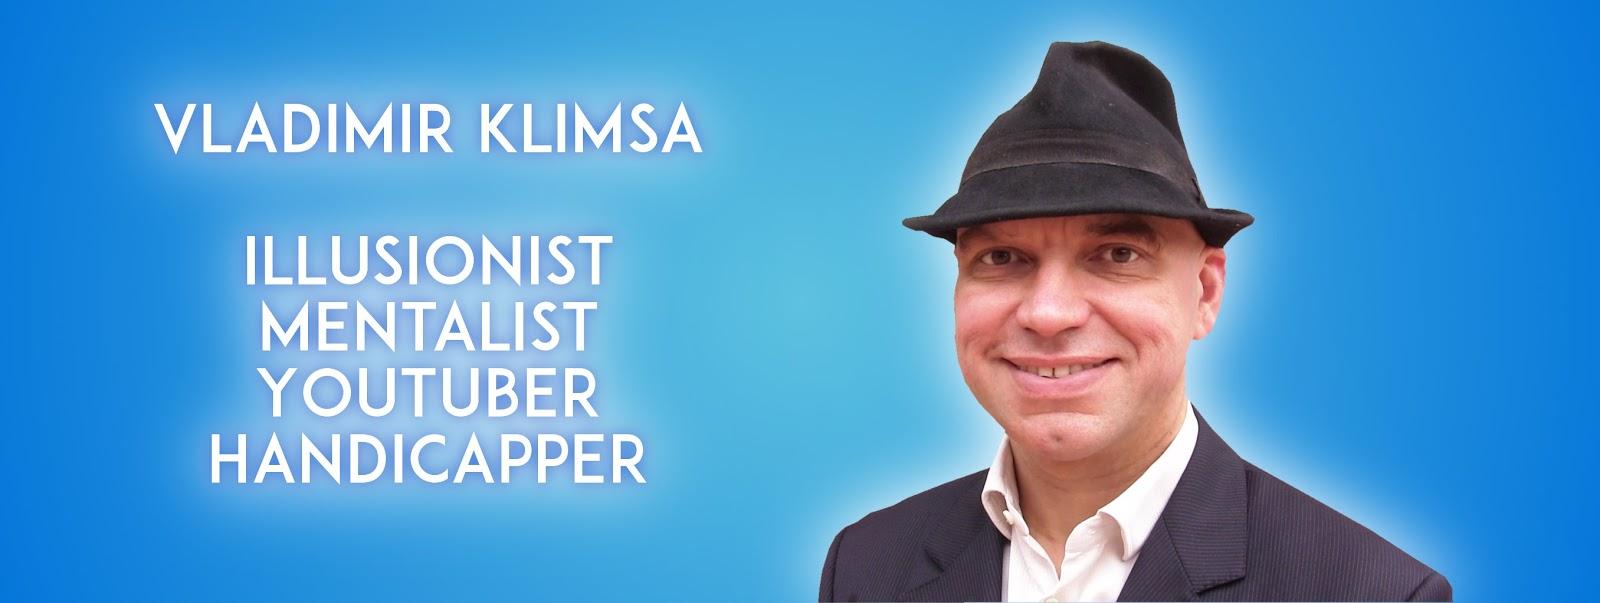 Vladimir Klimsa, Artist, Illusionist, Mentalist, Youtuber, Handicapper